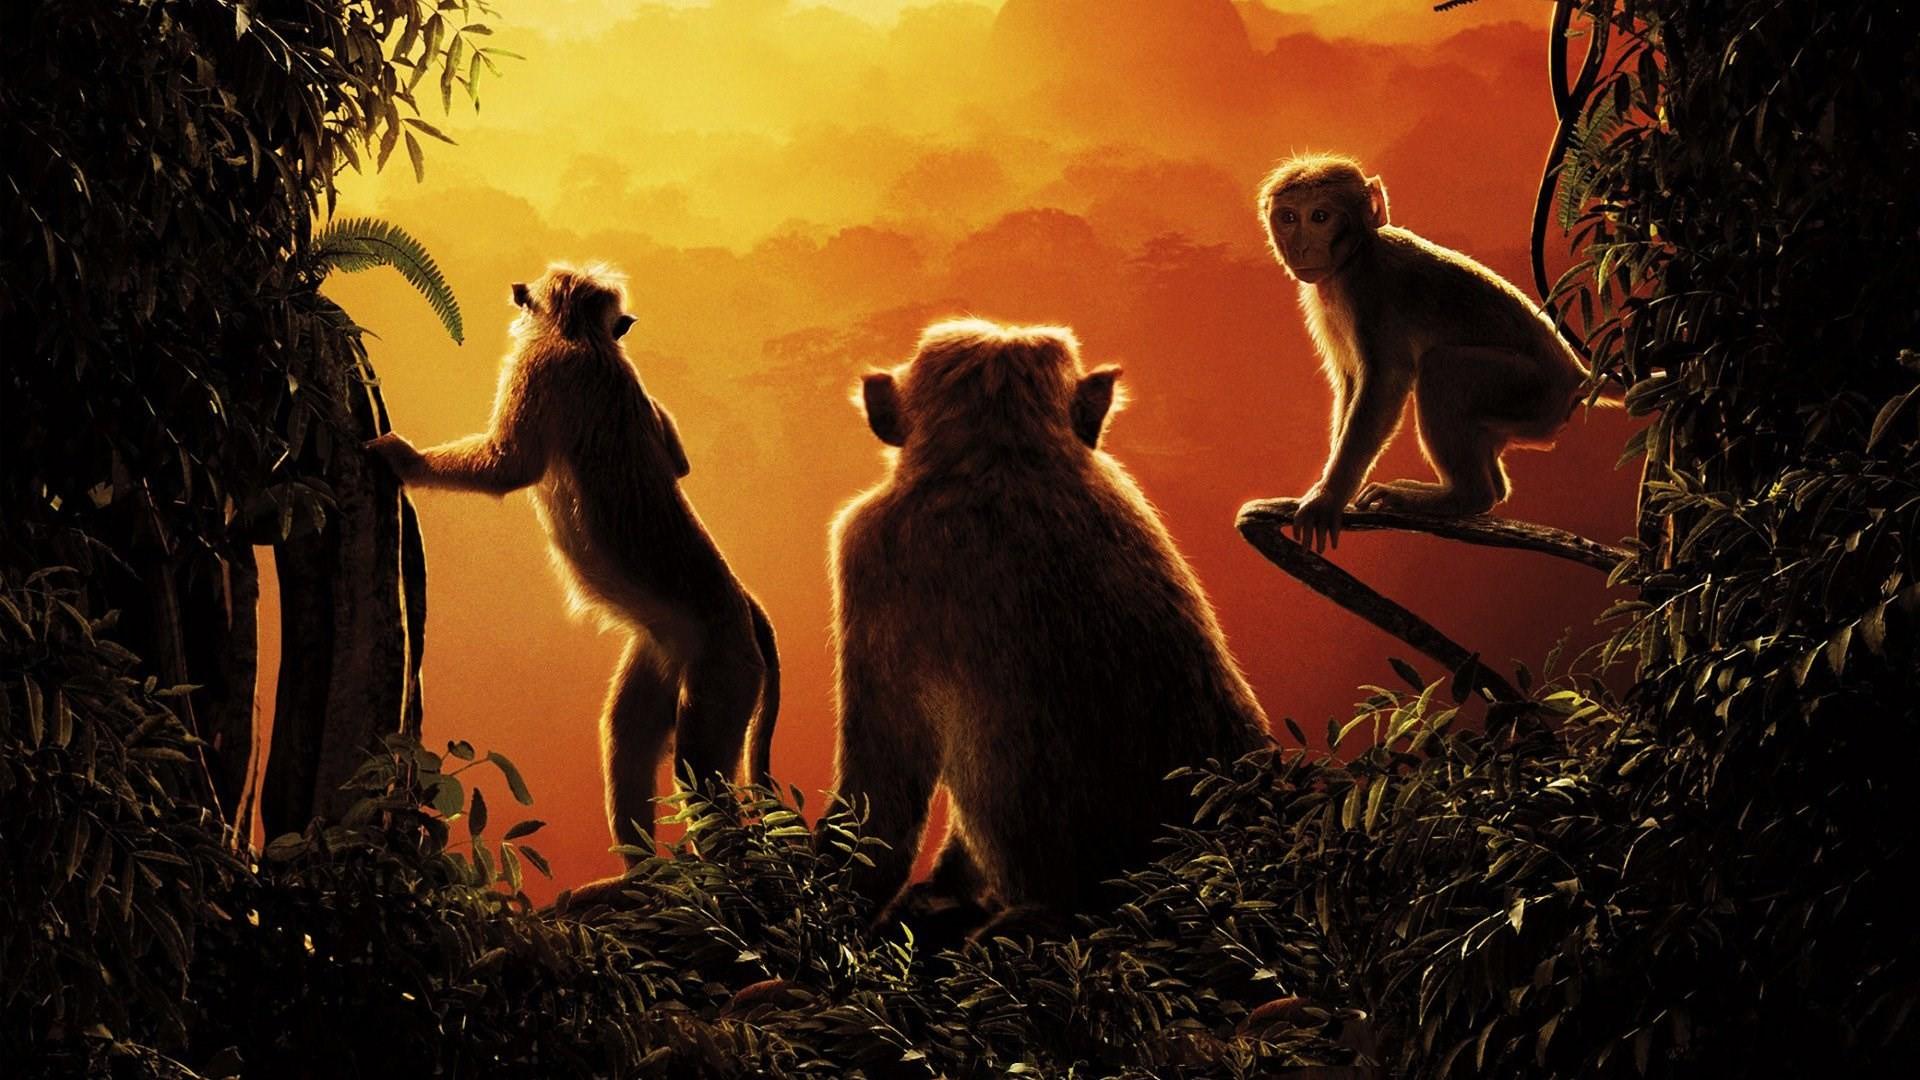 free high resolution wallpaper monkey kingdom, (426 kB)